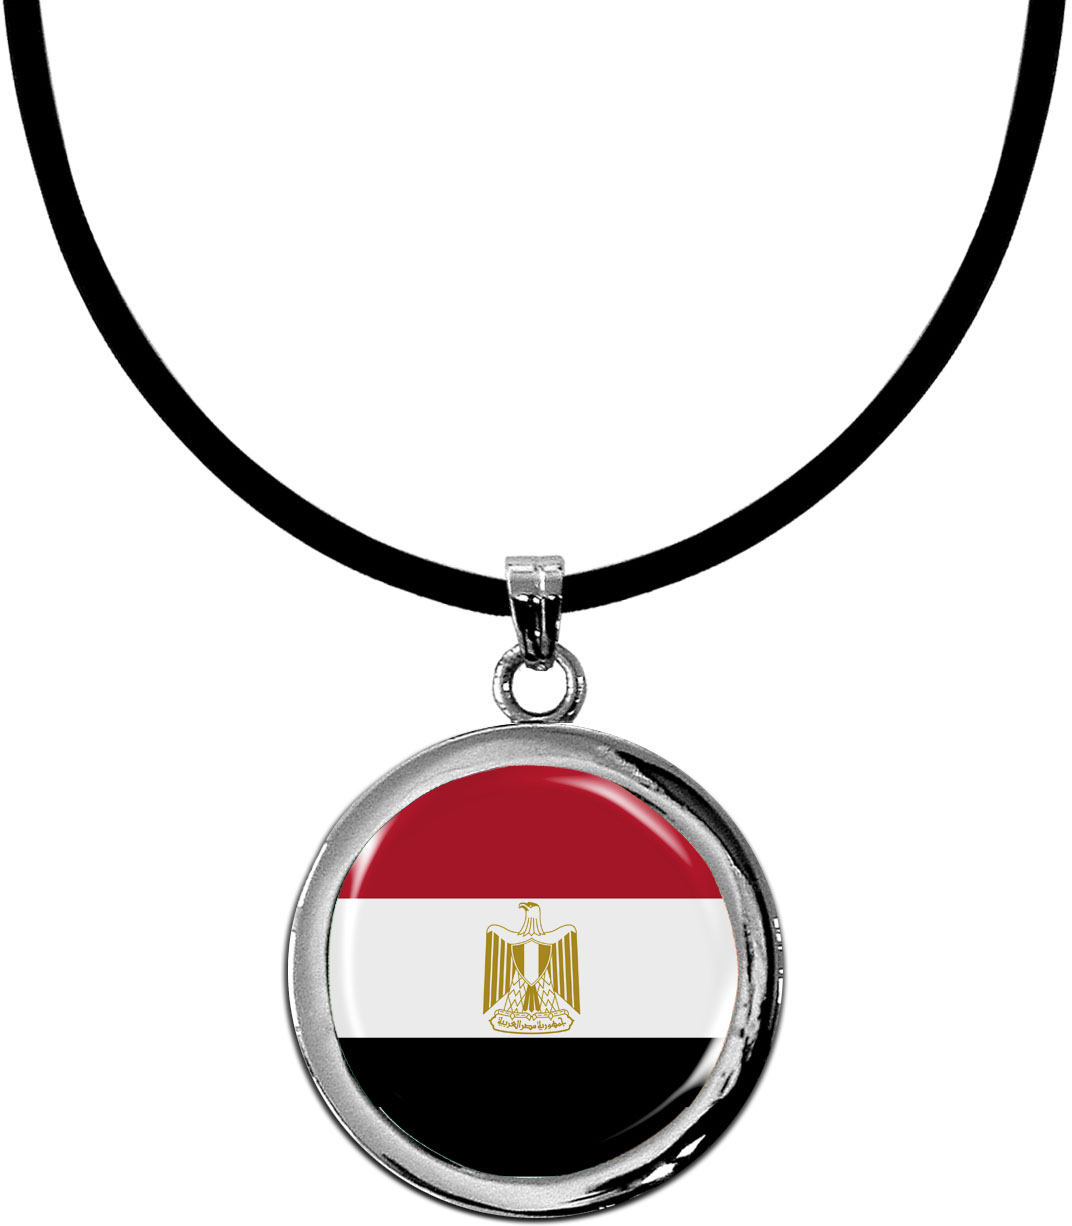 Kettenanhänger / Ägypten / Silikonband mit Silberverschluss